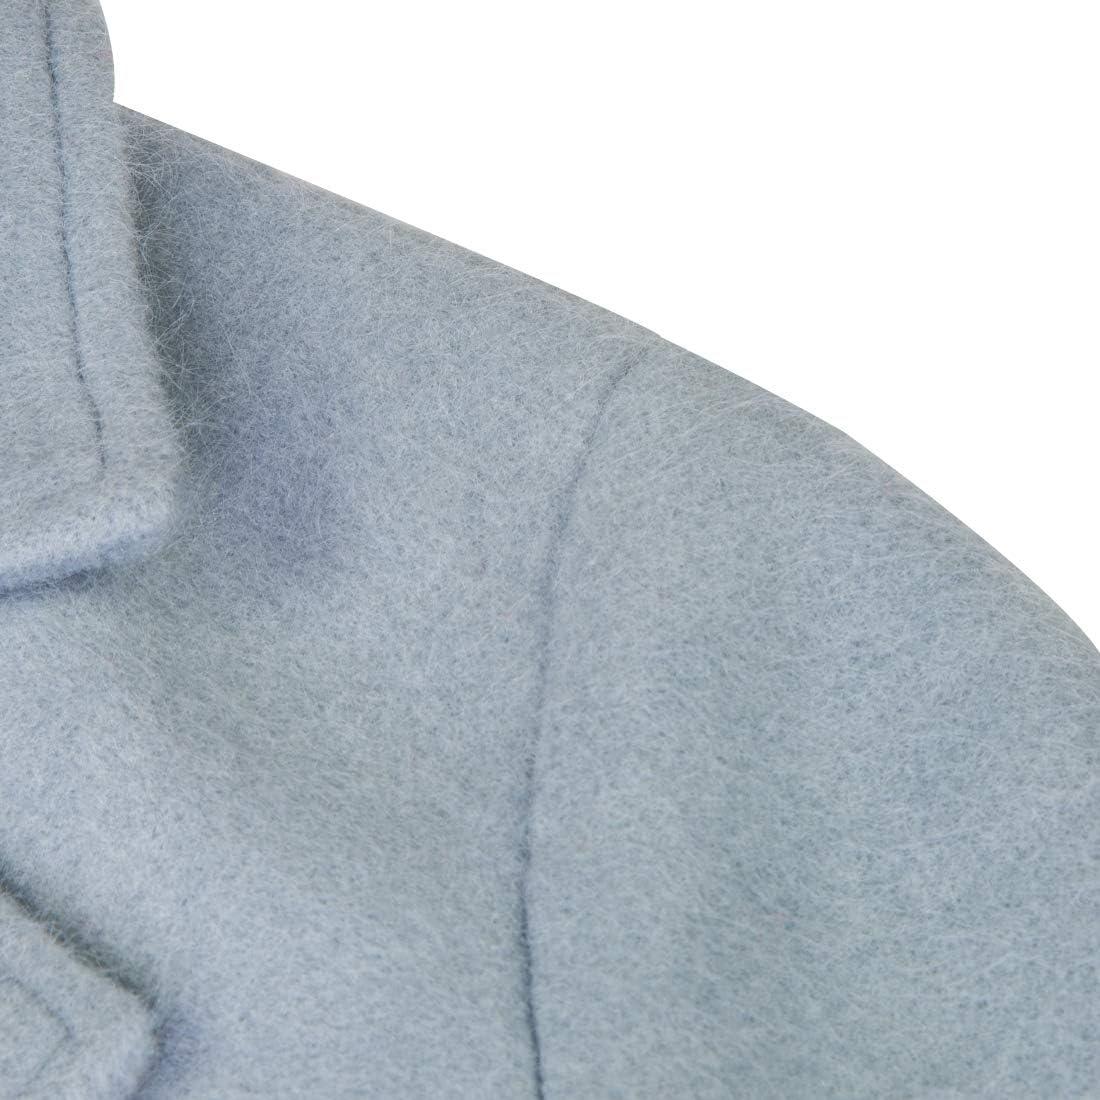 APTRO Damen M/äntel Lange Winter Wollmantel Trenchcoat /Übergangs Jacke WS01